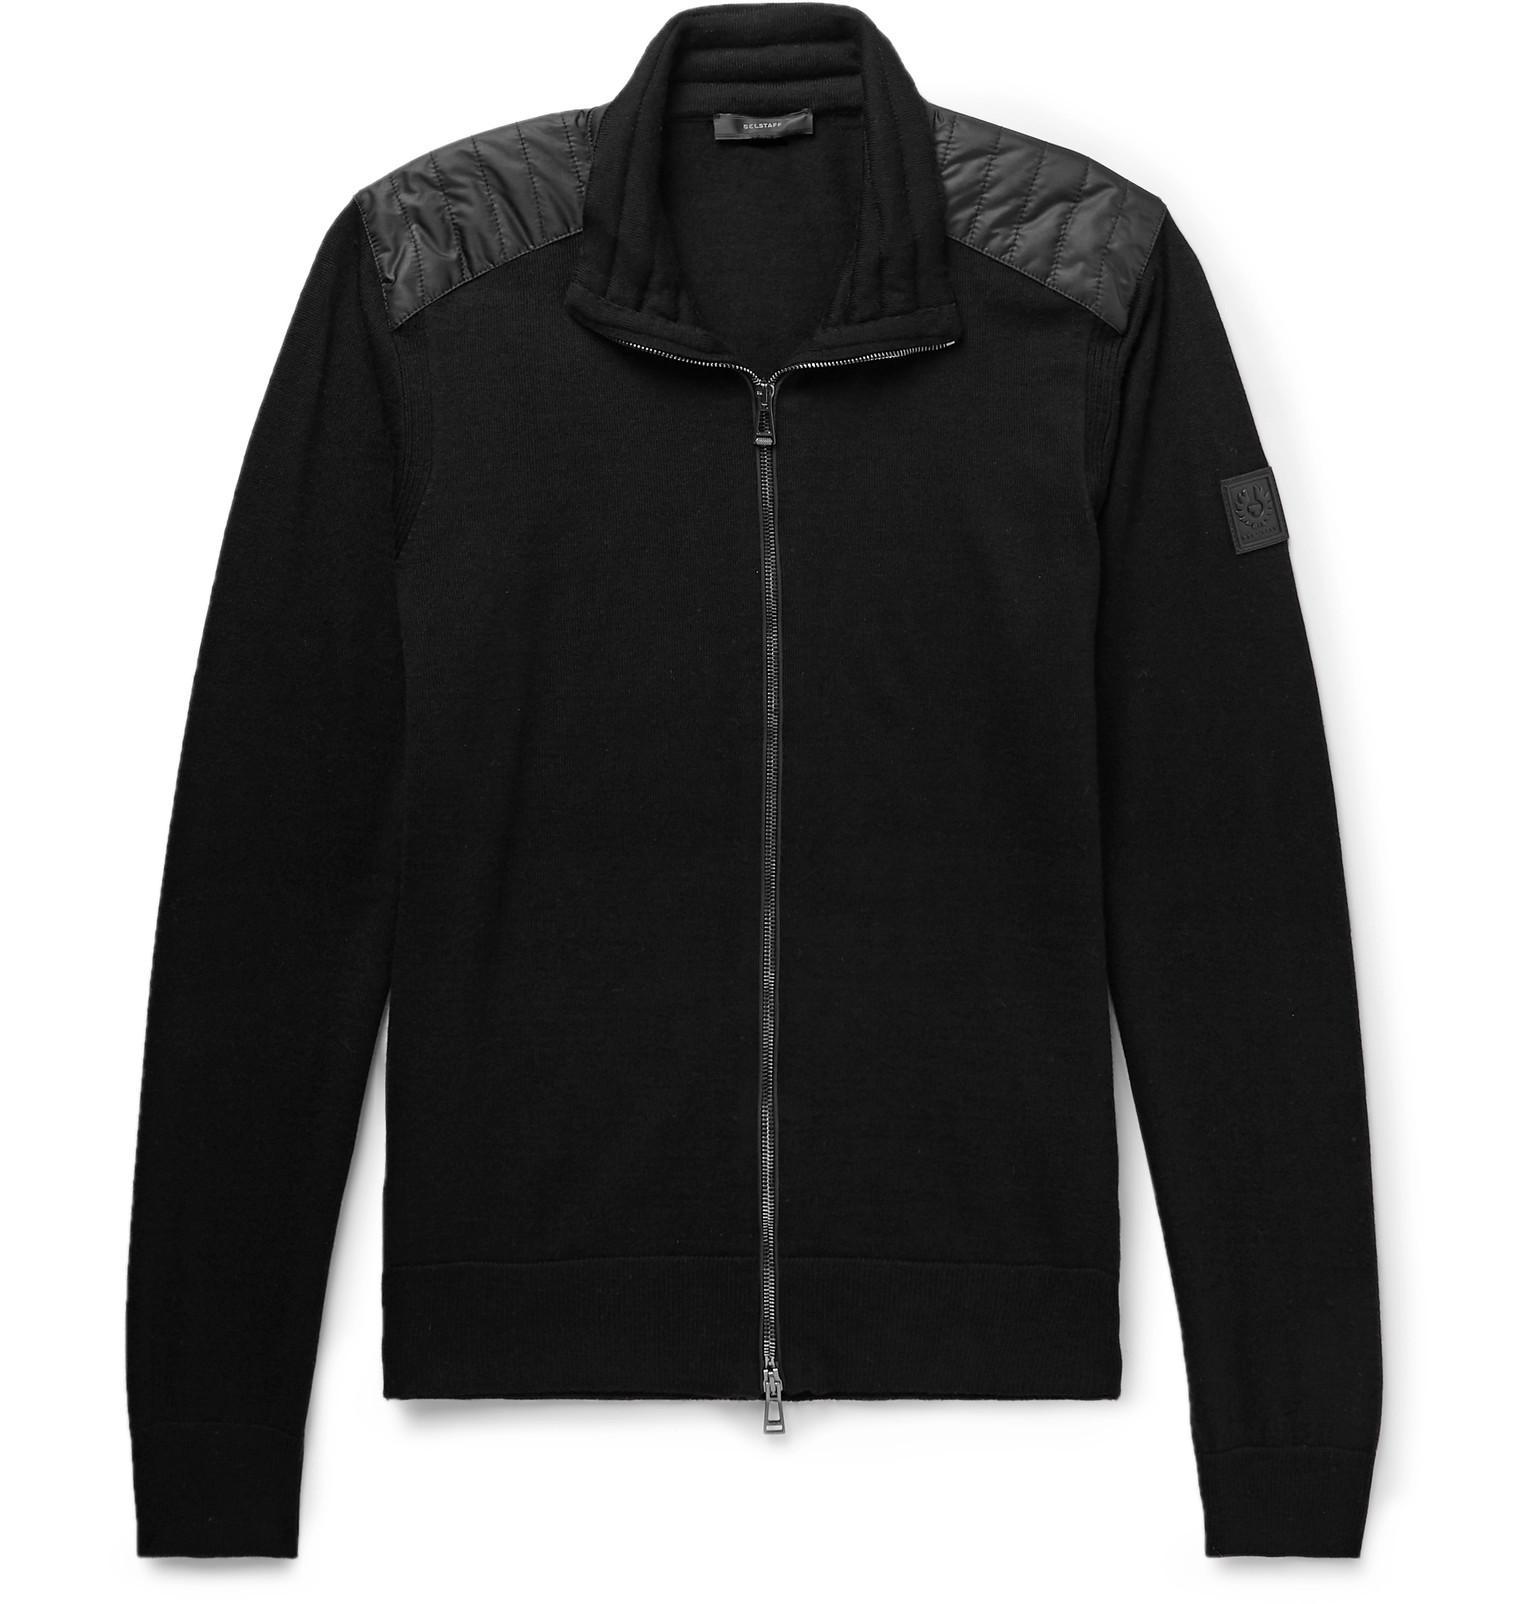 3af598f9b312 Belstaff. Men s Black Kelby Slim-fit Quilted Shell-panelled Virgin Wool  Zip-up Cardigan